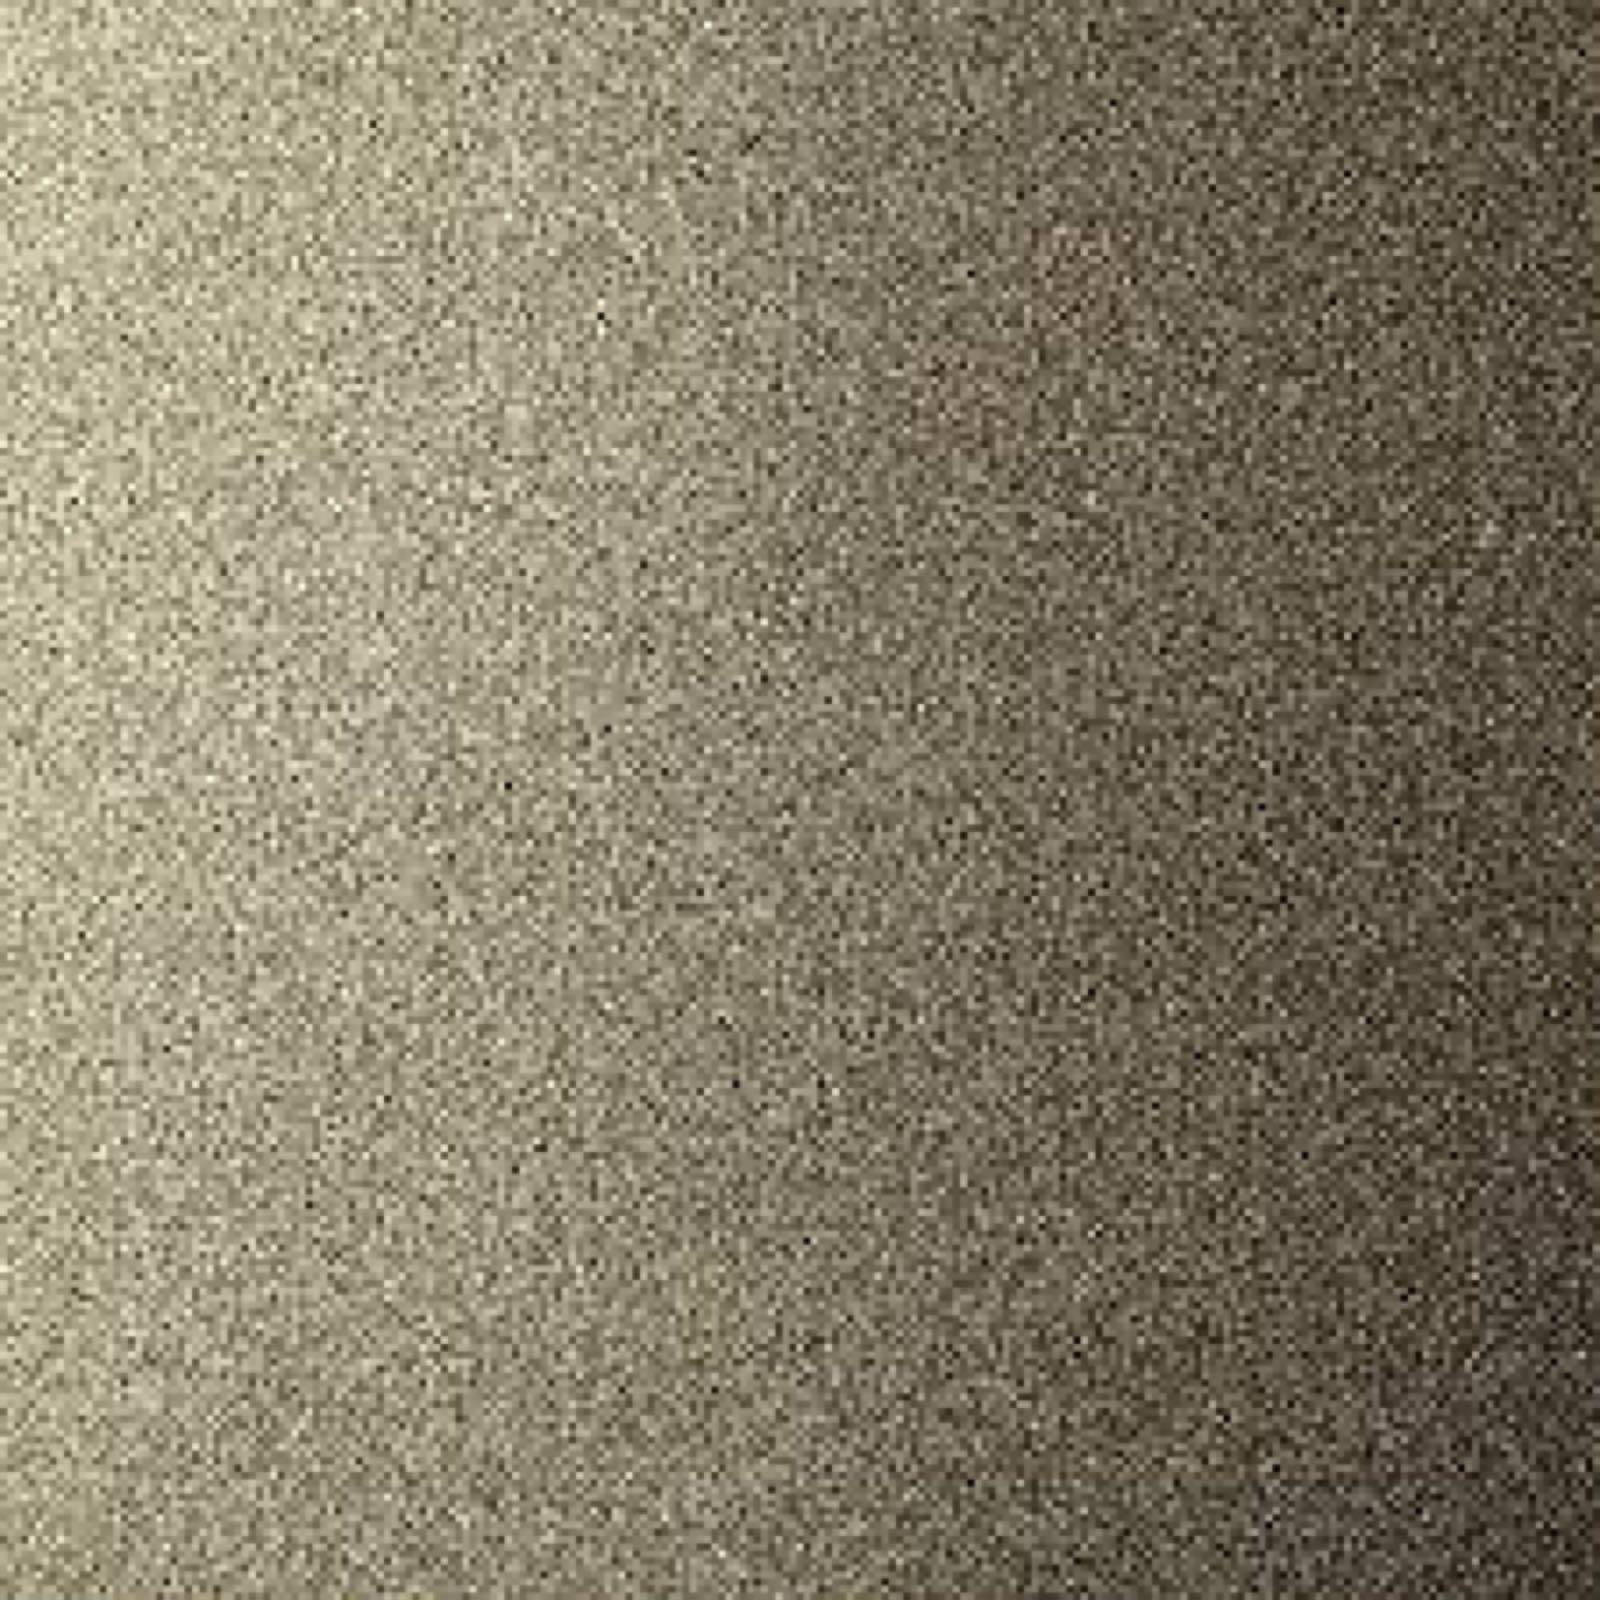 Glitterkartong 12´x12´ gold leaf